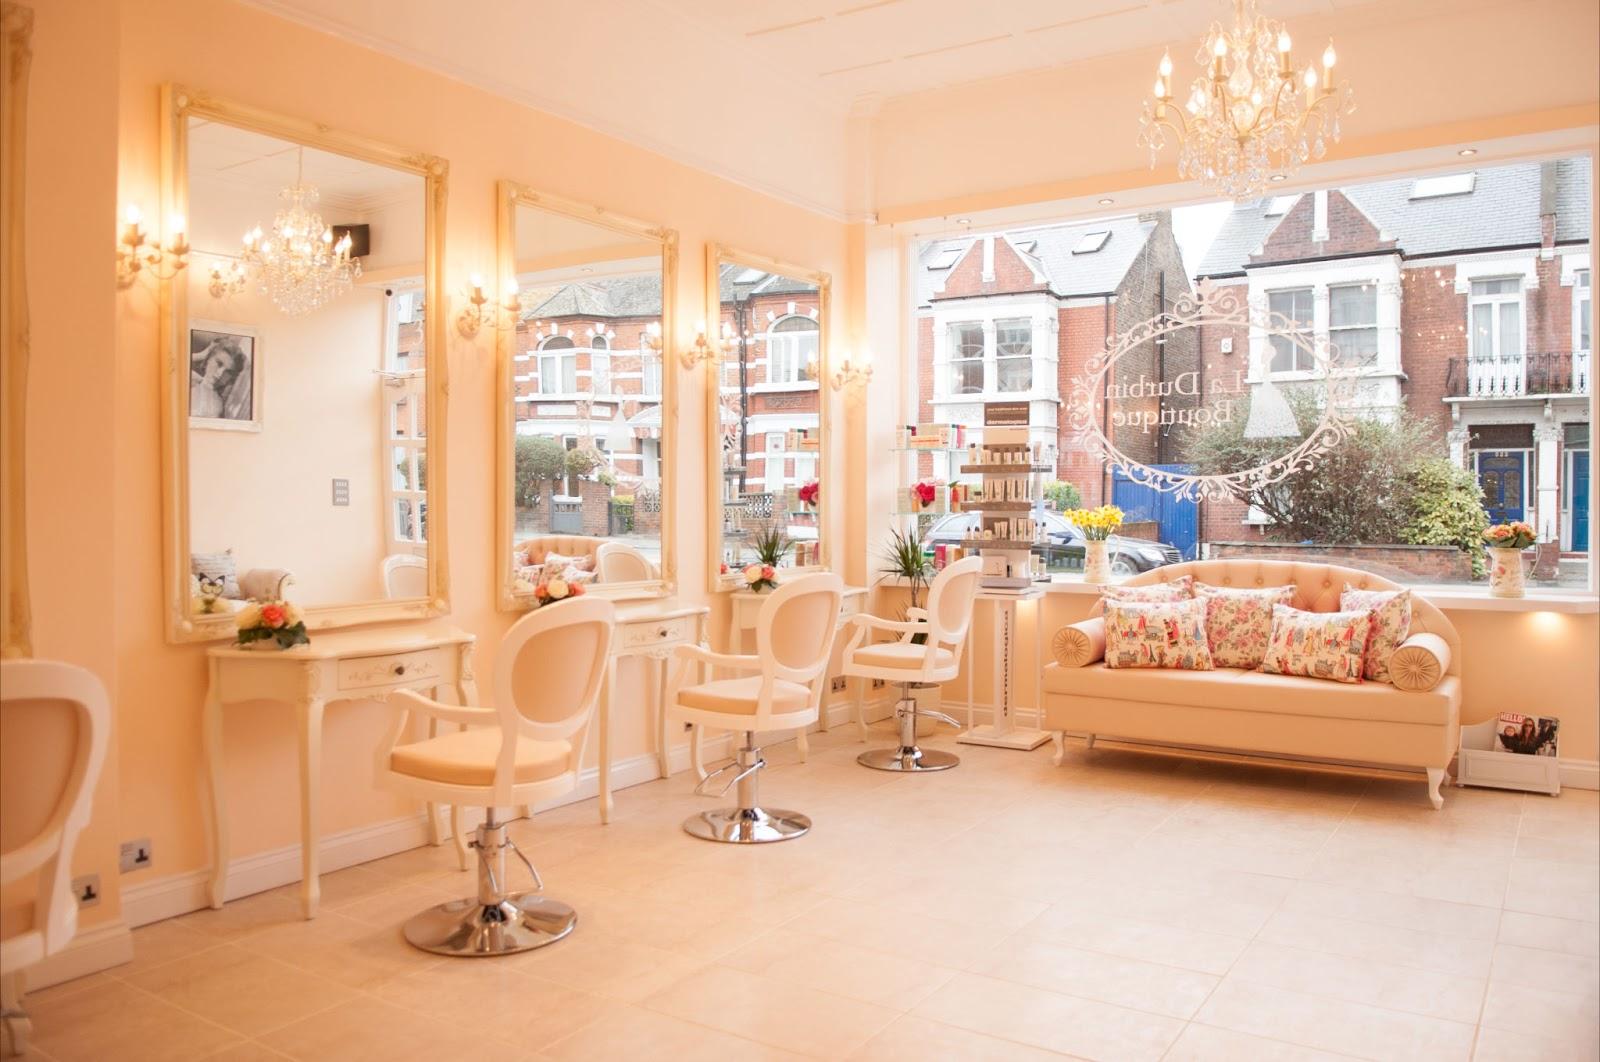 Southwestsix boutique beauty by bishops park for Beauty hair salon